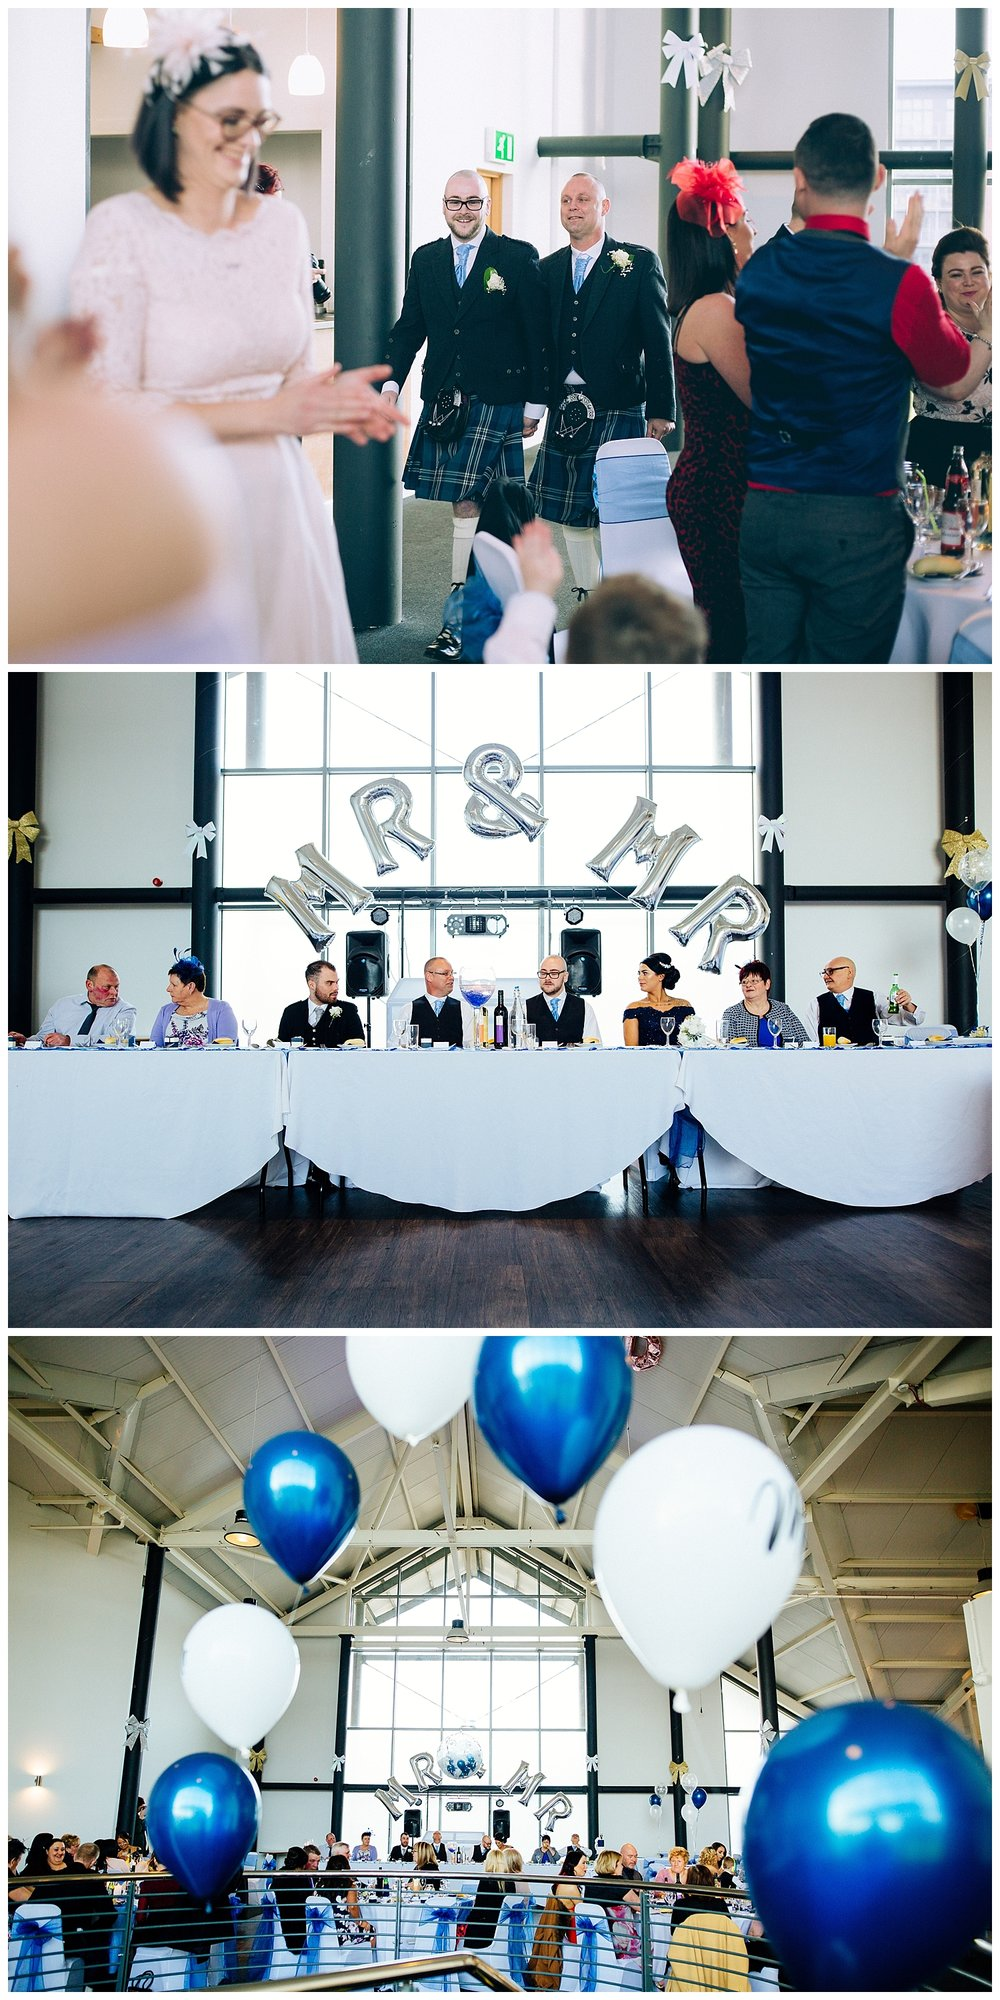 Kirsty_Brown_Wedding_Photography_0028.jpg